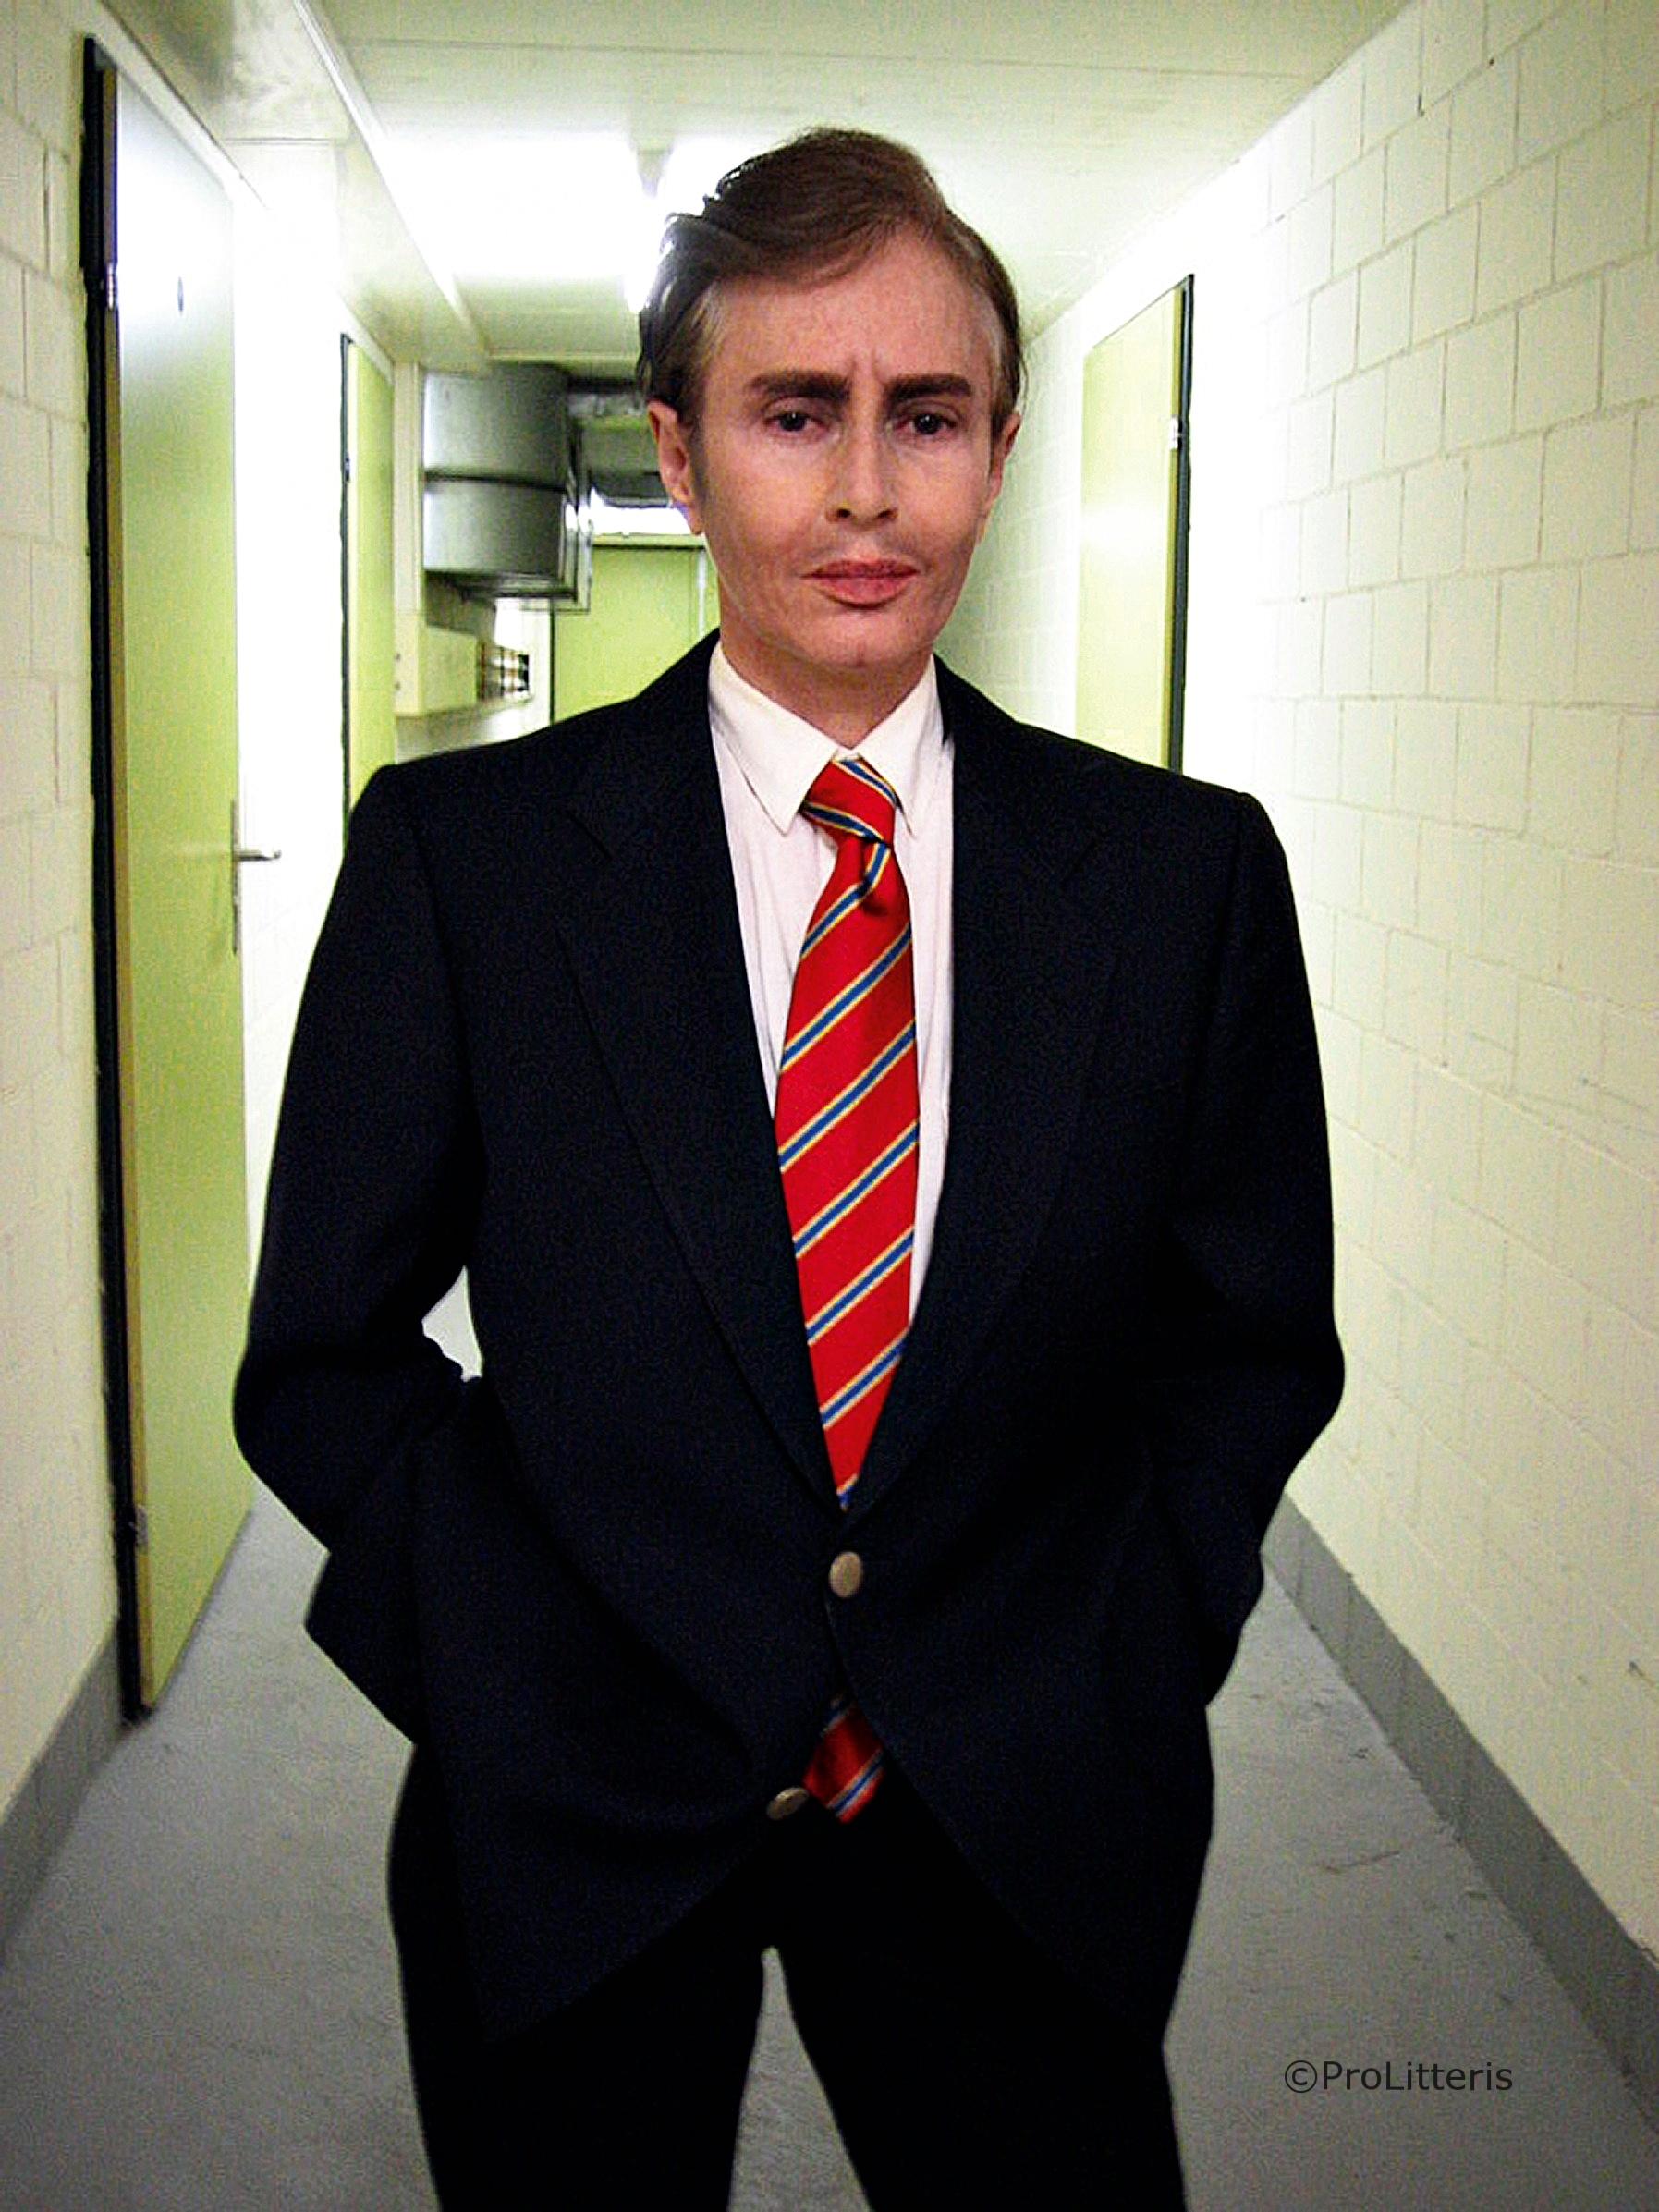 MANON als Edgar, 2006 - Bild